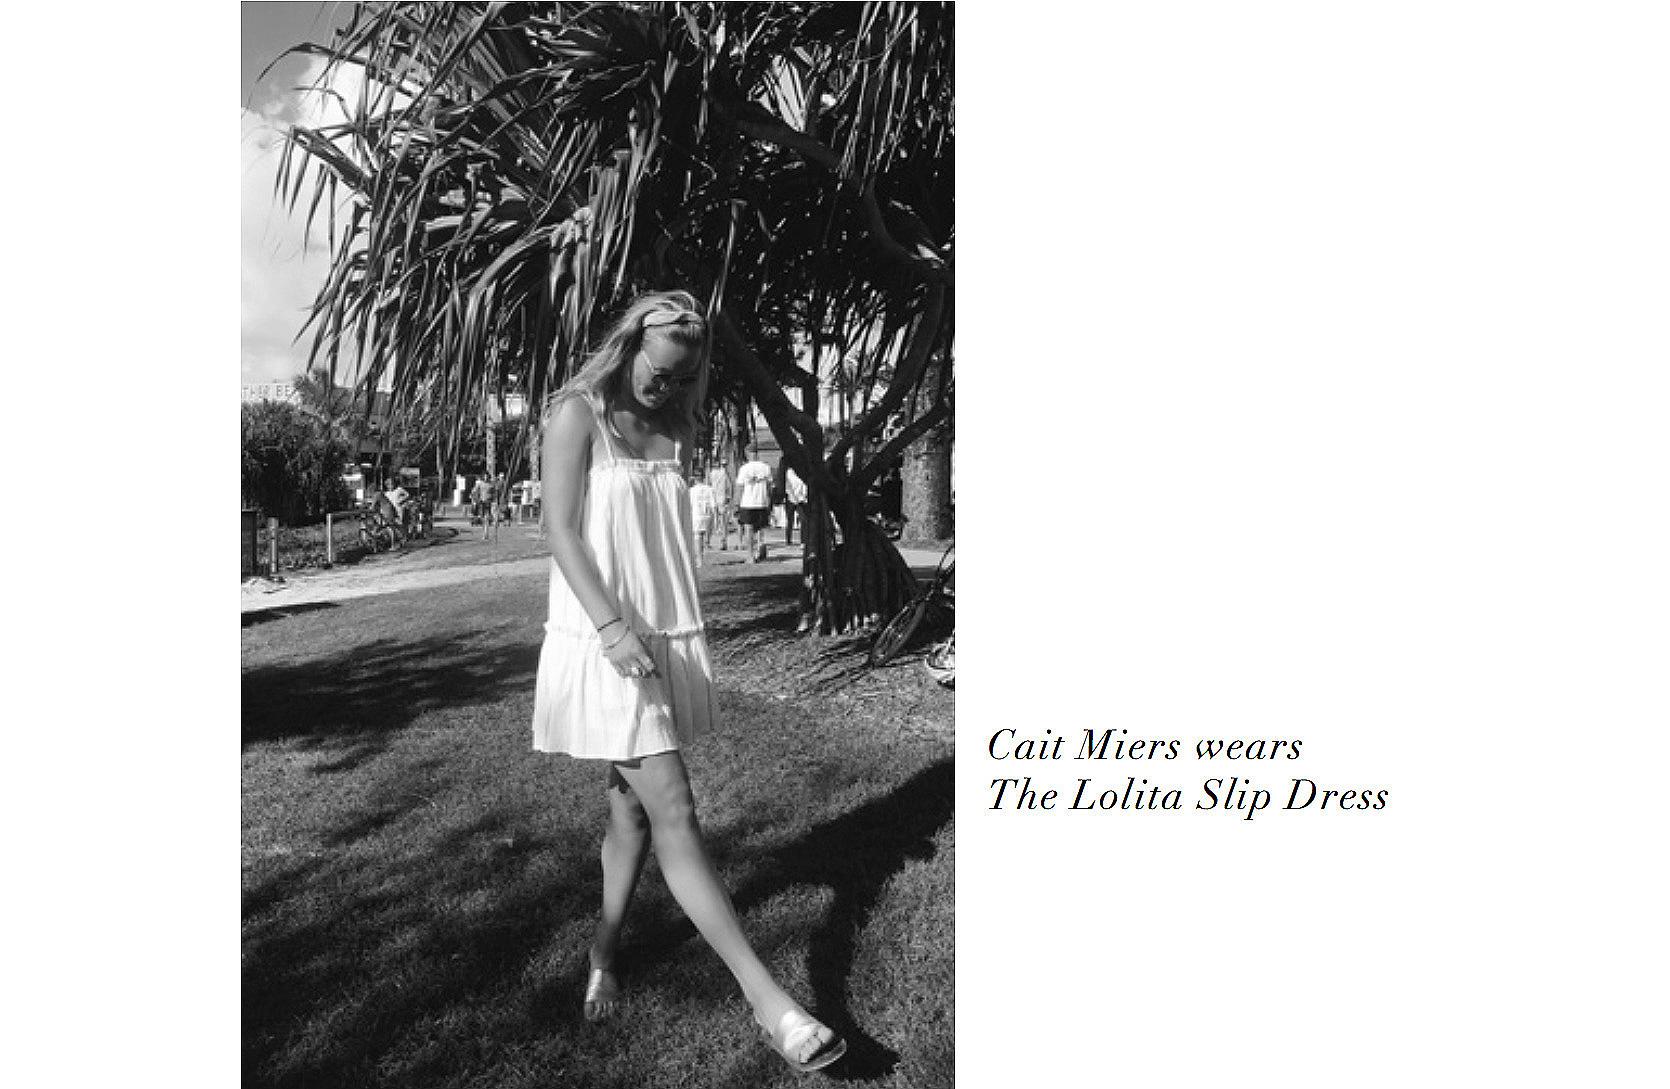 the-lolita-slip-dress.jpg